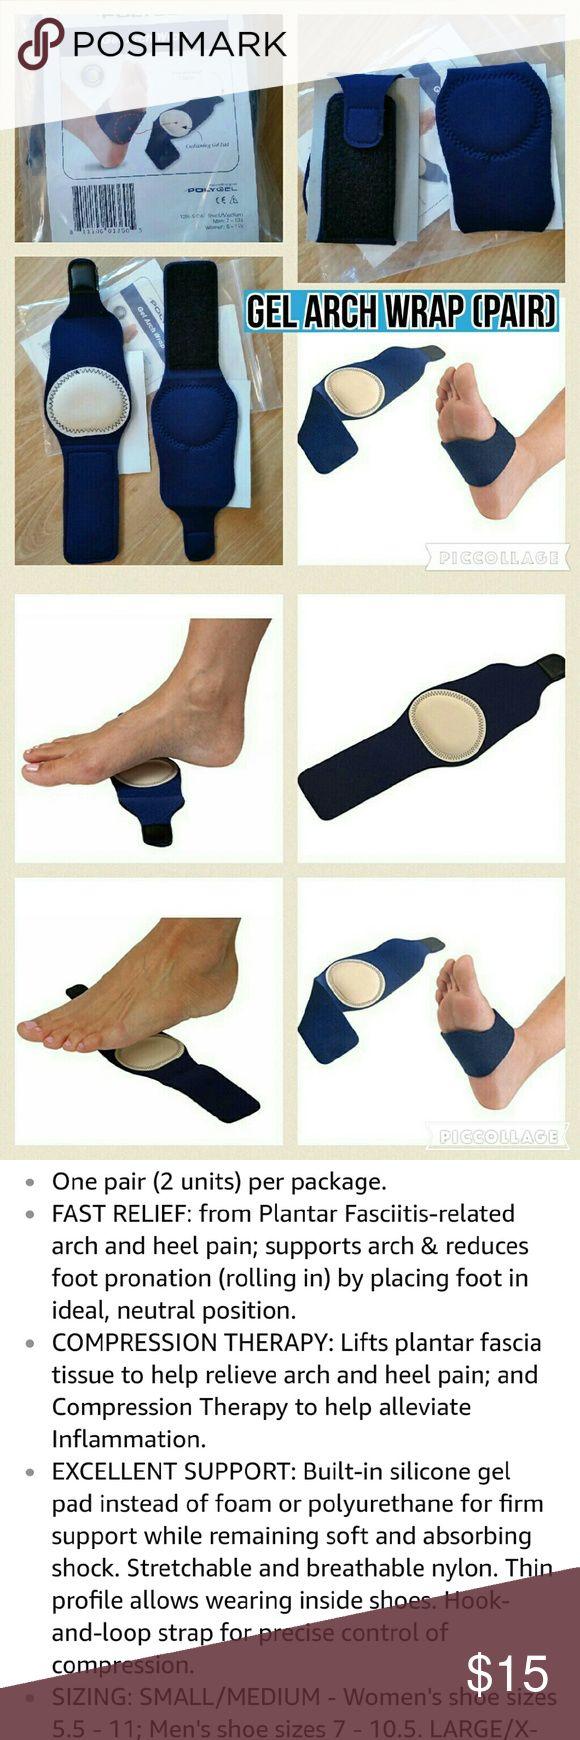 Women's sandals good for plantar fasciitis uk - Gel Arch Wrap Support For Men Women